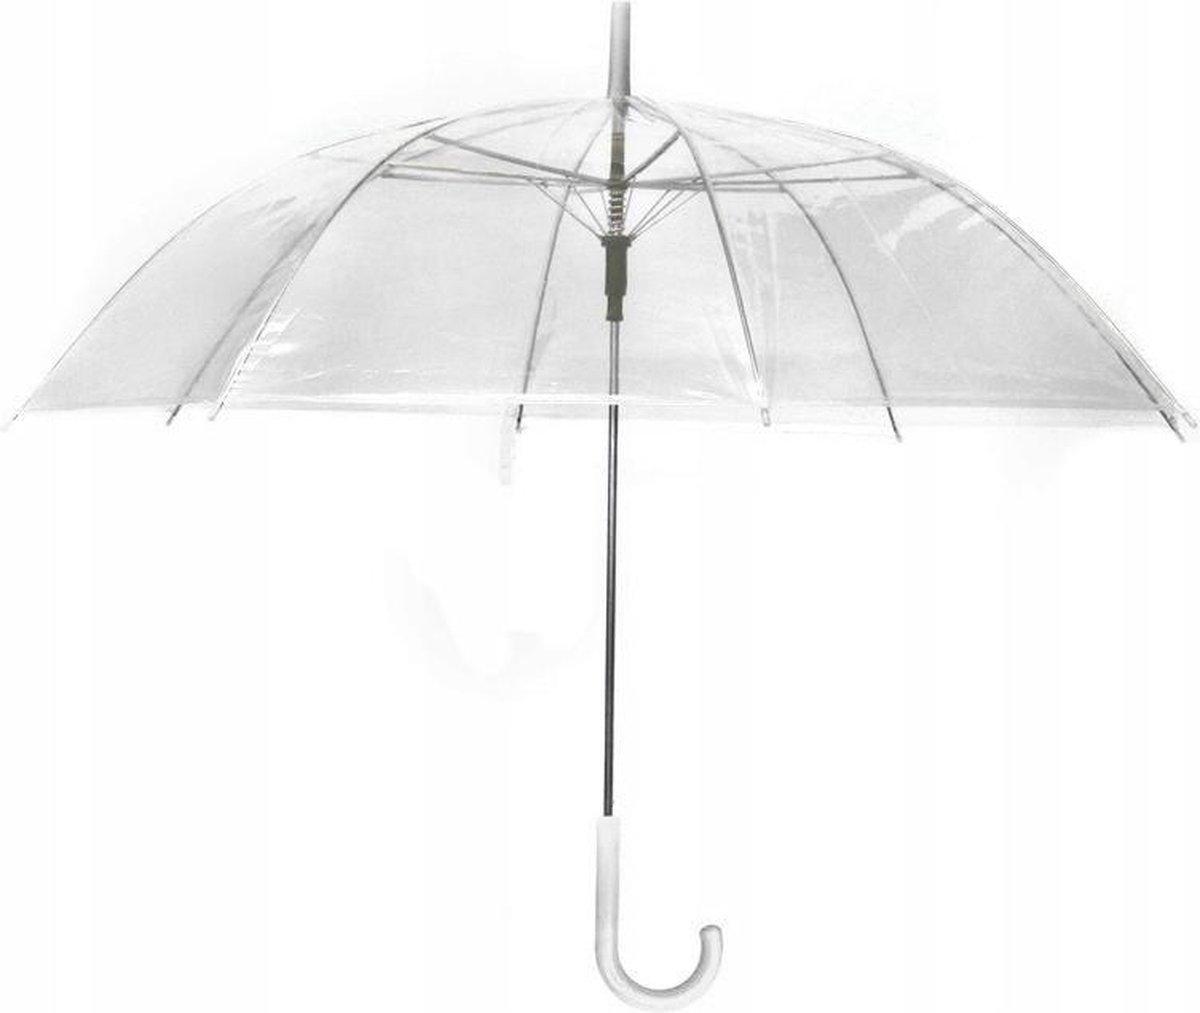 Transparante Opvouwbare Paraplu - Doorzichtige Automatisch Opende Paraplu - Umbrella Opvouwbaar - 8